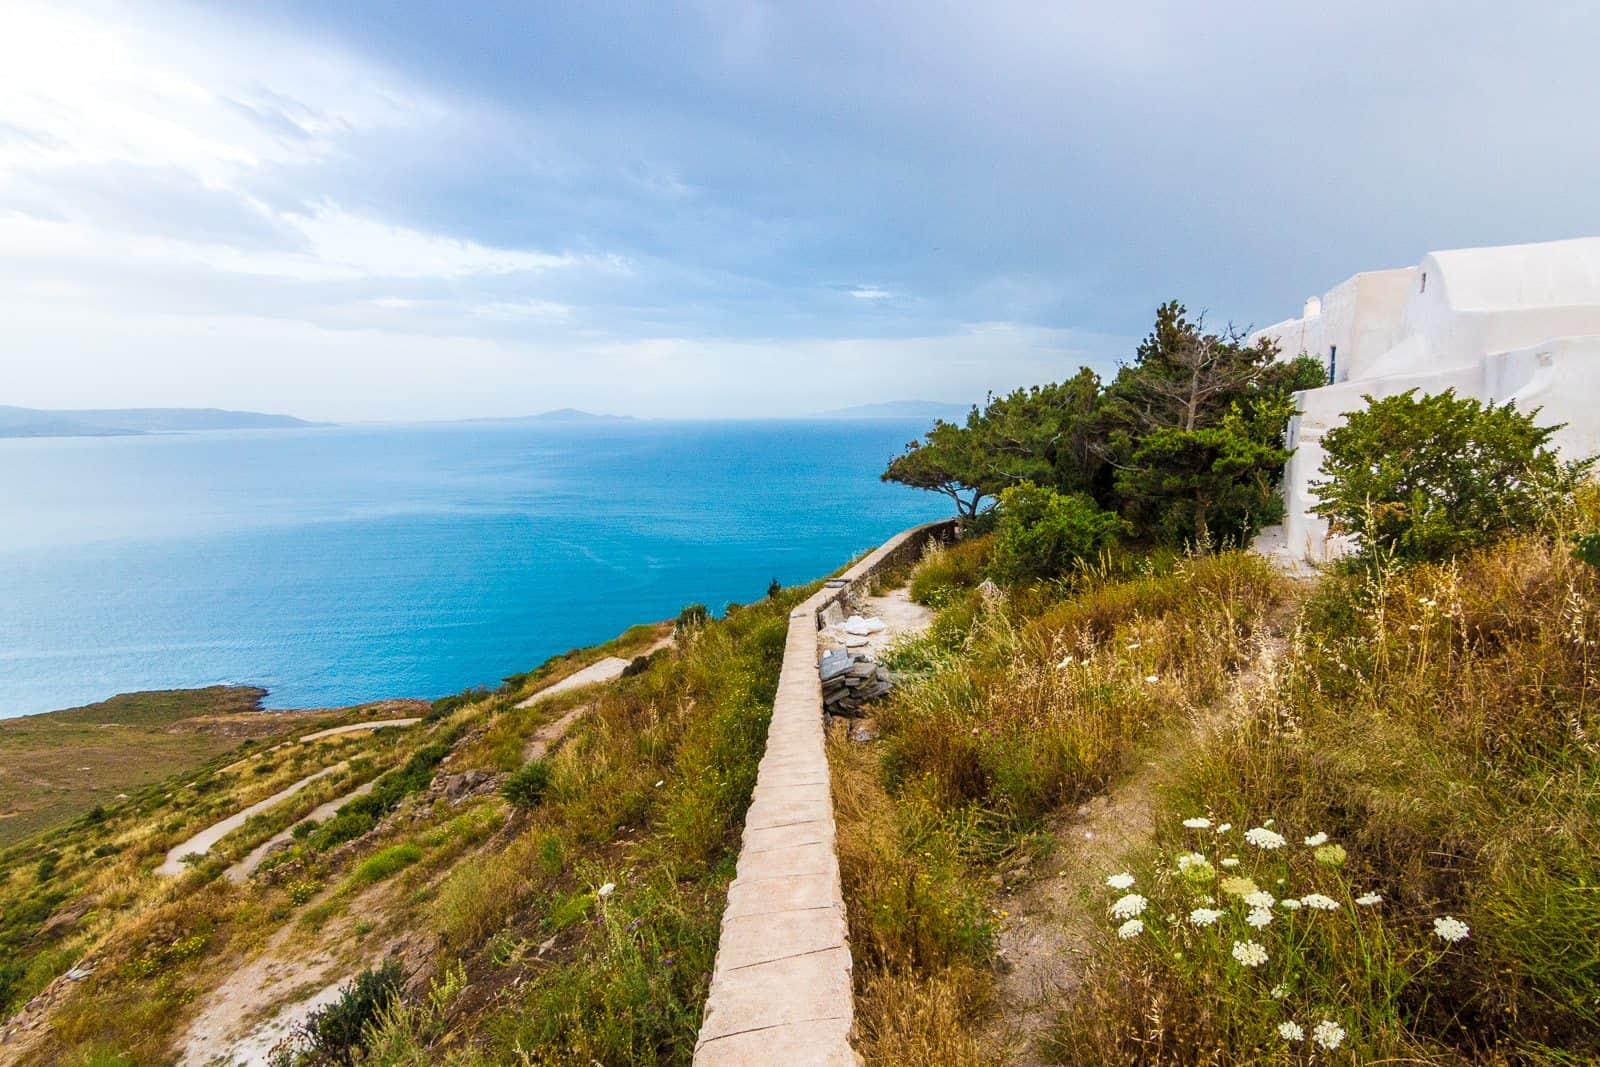 Agios Antonios, Island of Paros, Pictures of Greece